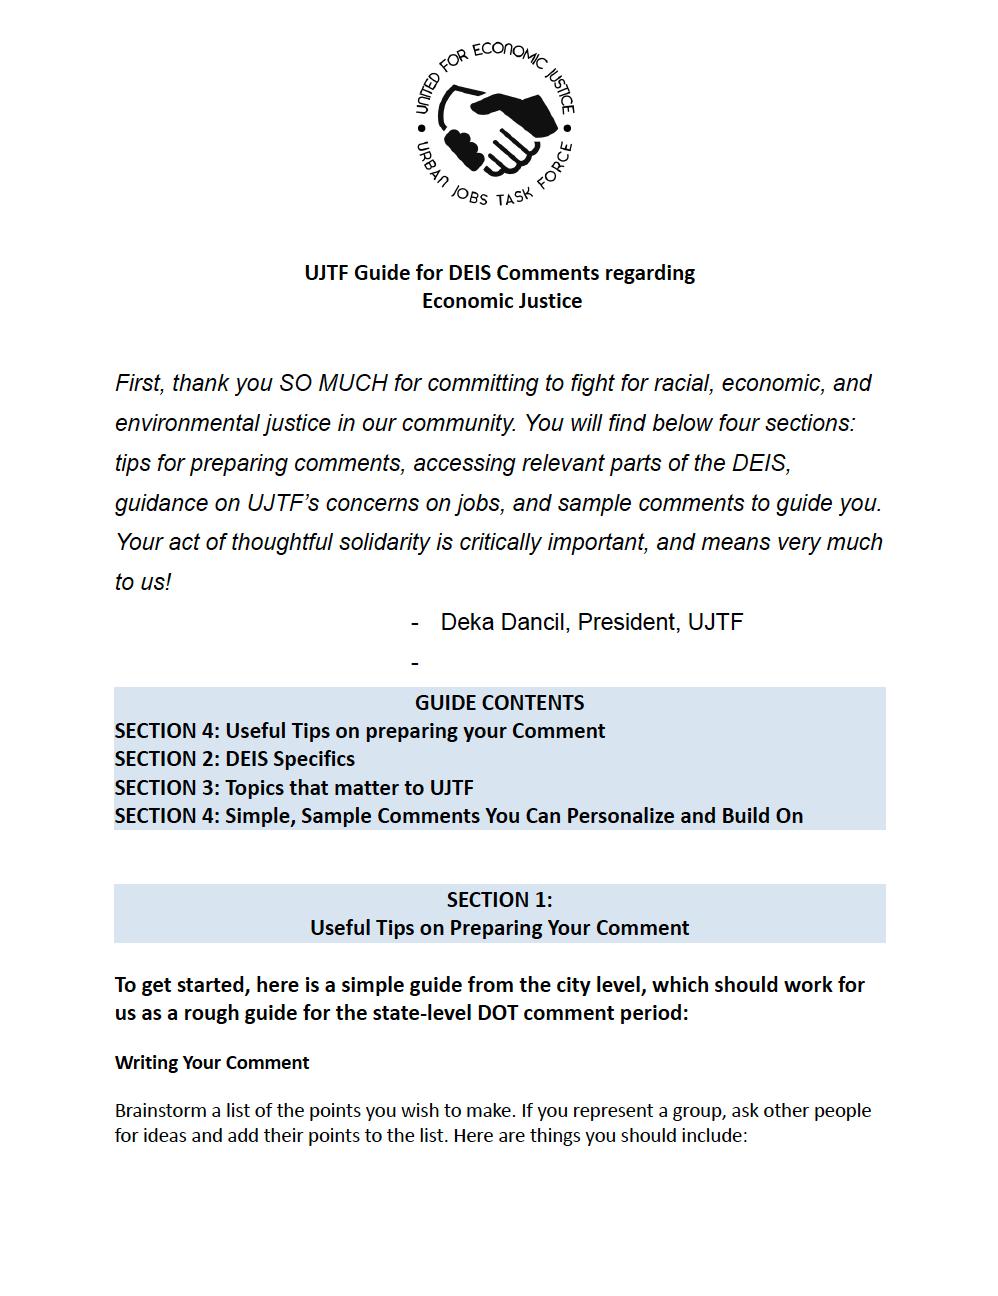 UJTF Guide for DEIS Comments regarding Economic Justice